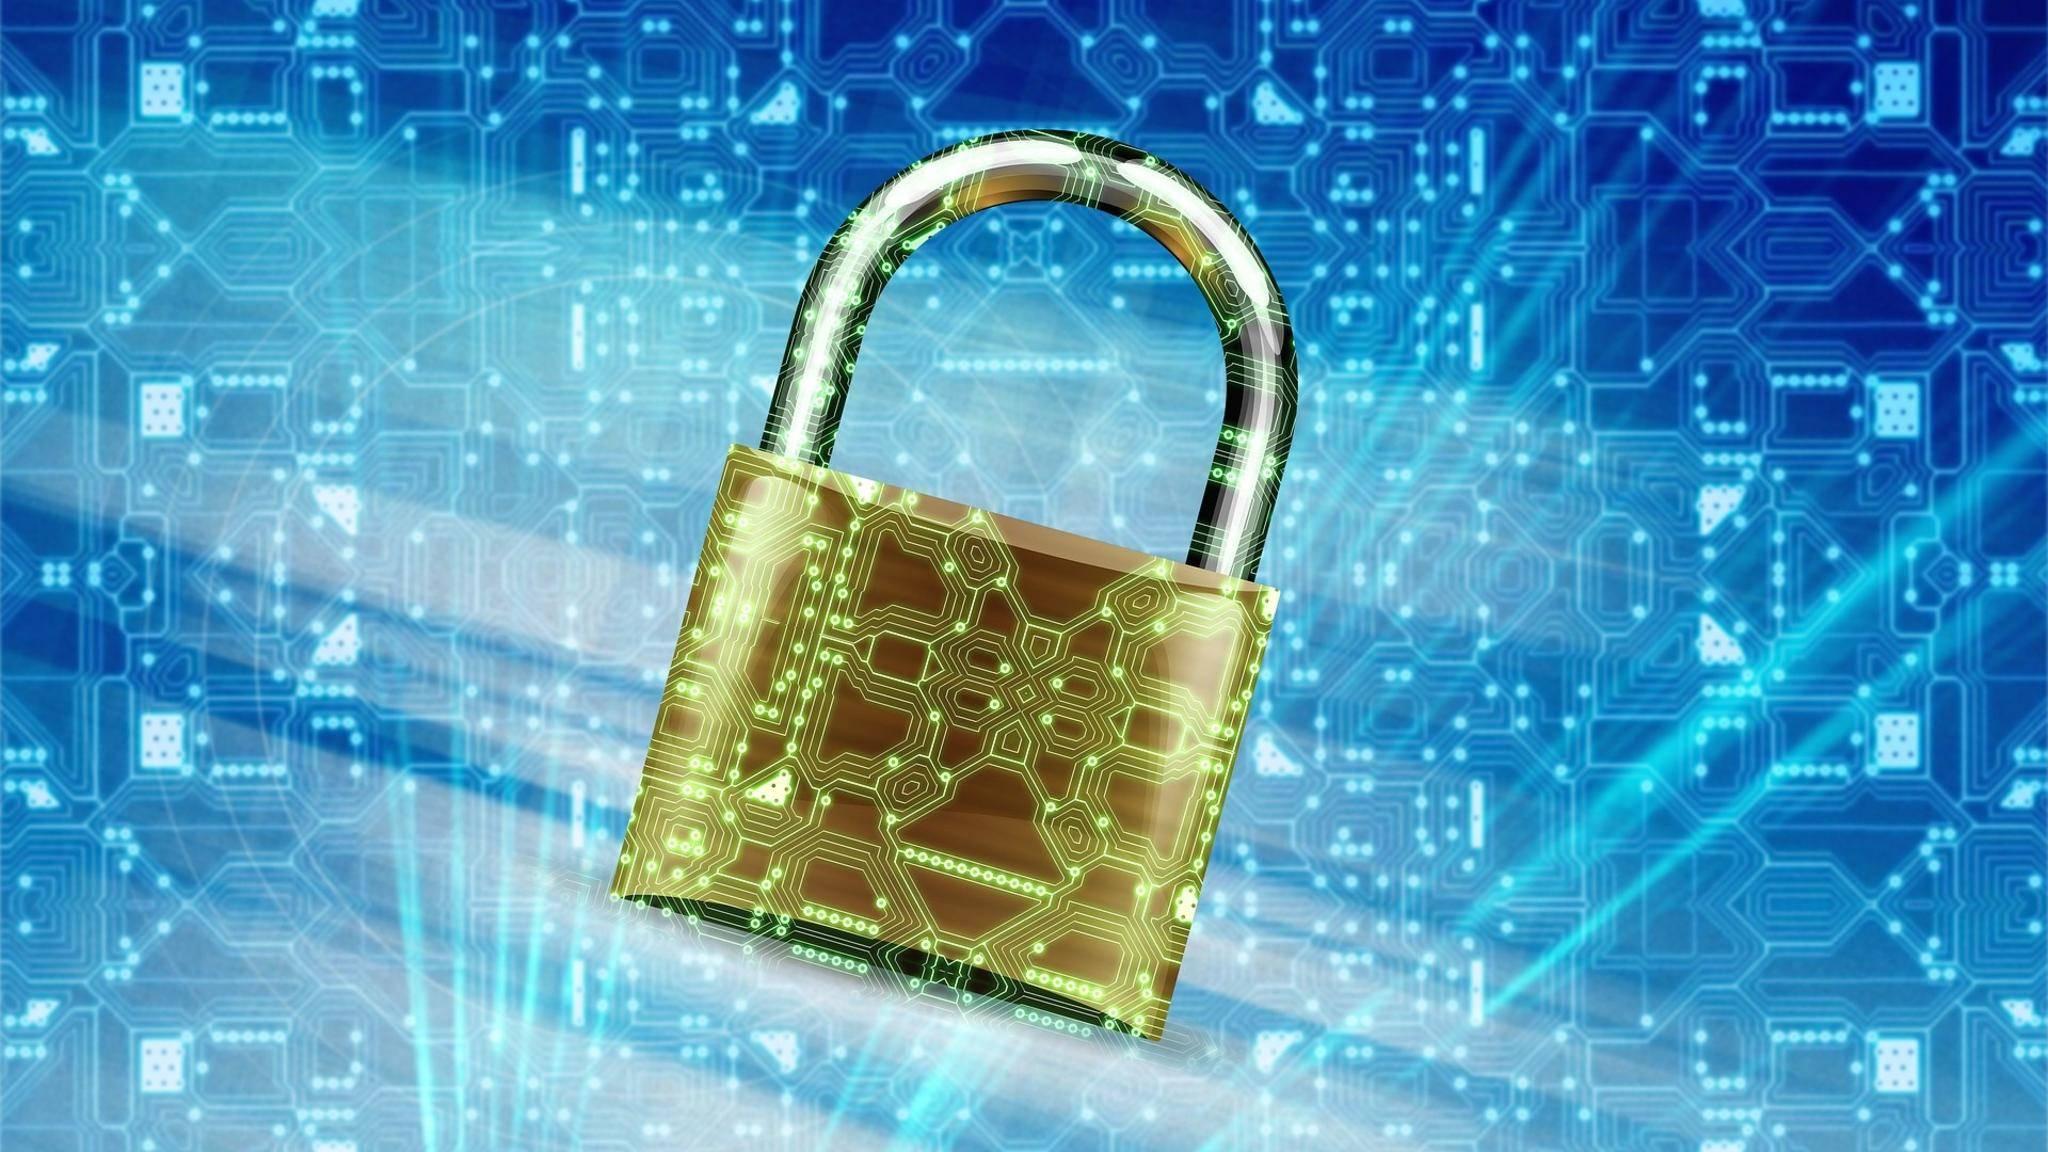 Sicherheit Security Schloss Malware Virus